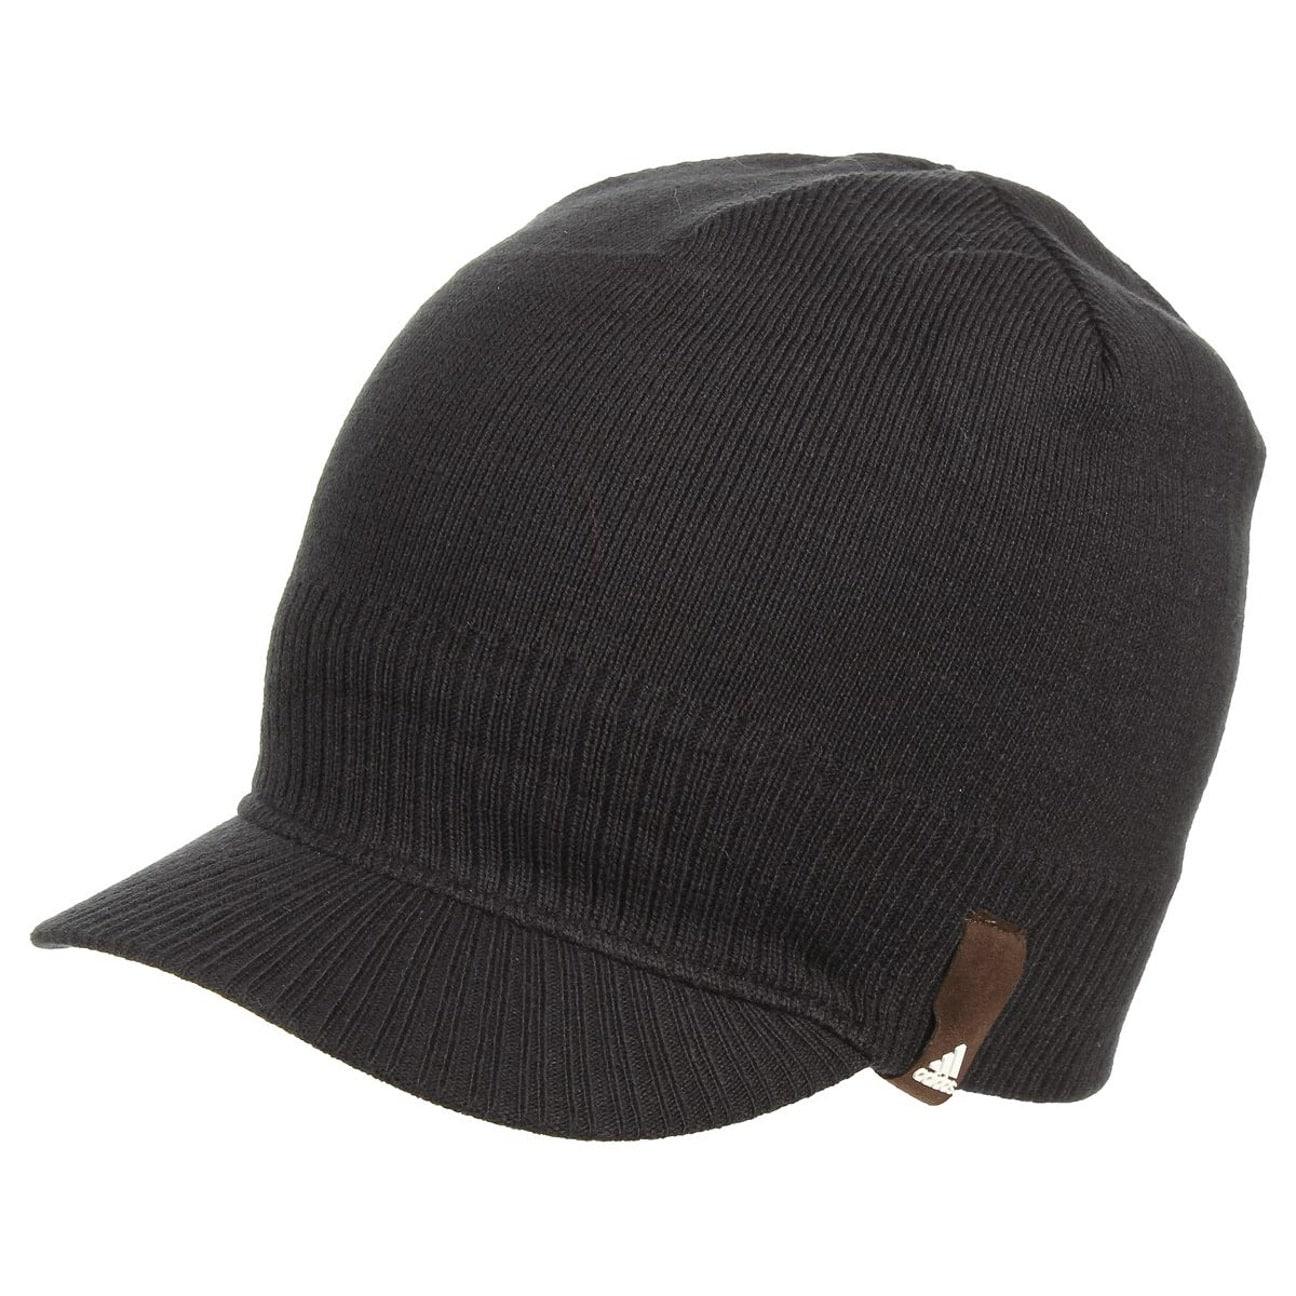 Gorro con Visera Slim by adidas - Gorros - sombreroshop.es e0ba38bab79